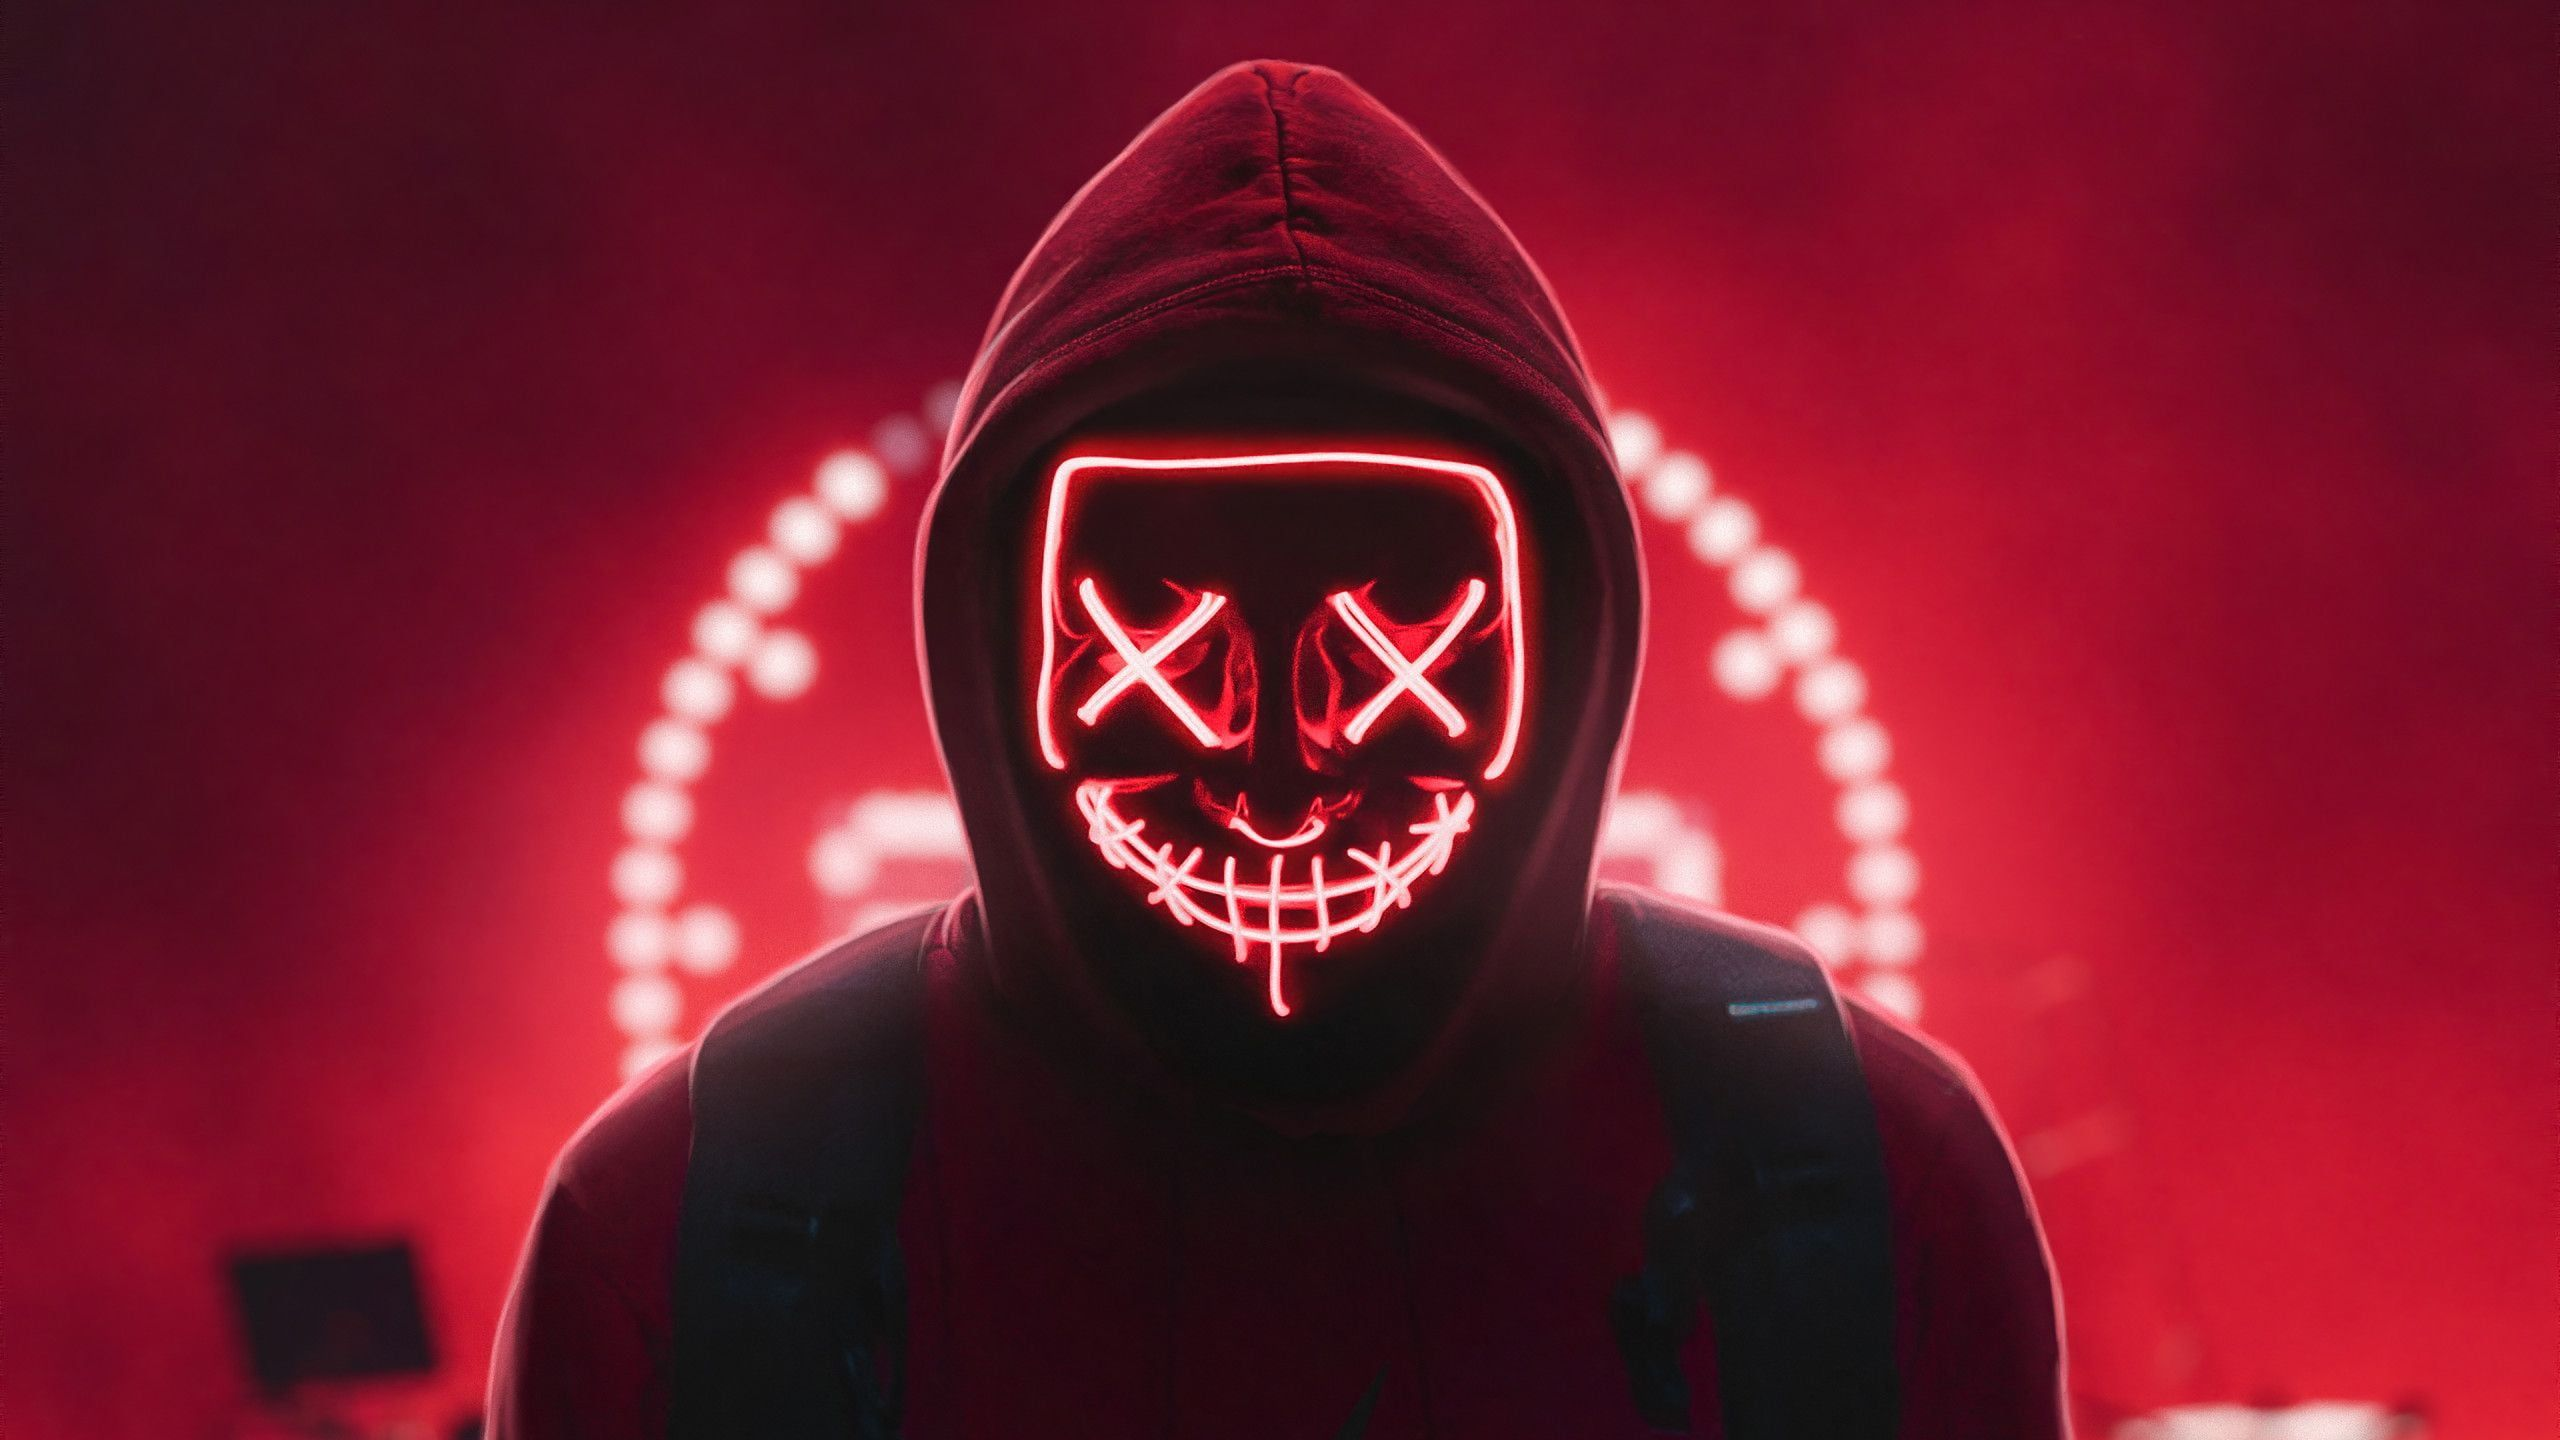 Red Neon Mask Digital Art Leds Red Neon Mask Creepy Eyes Creepy Photoshop Lights Faceless Hoods Artwor Creepy Eyes Marvel Wallpaper Hd Neon Wallpaper